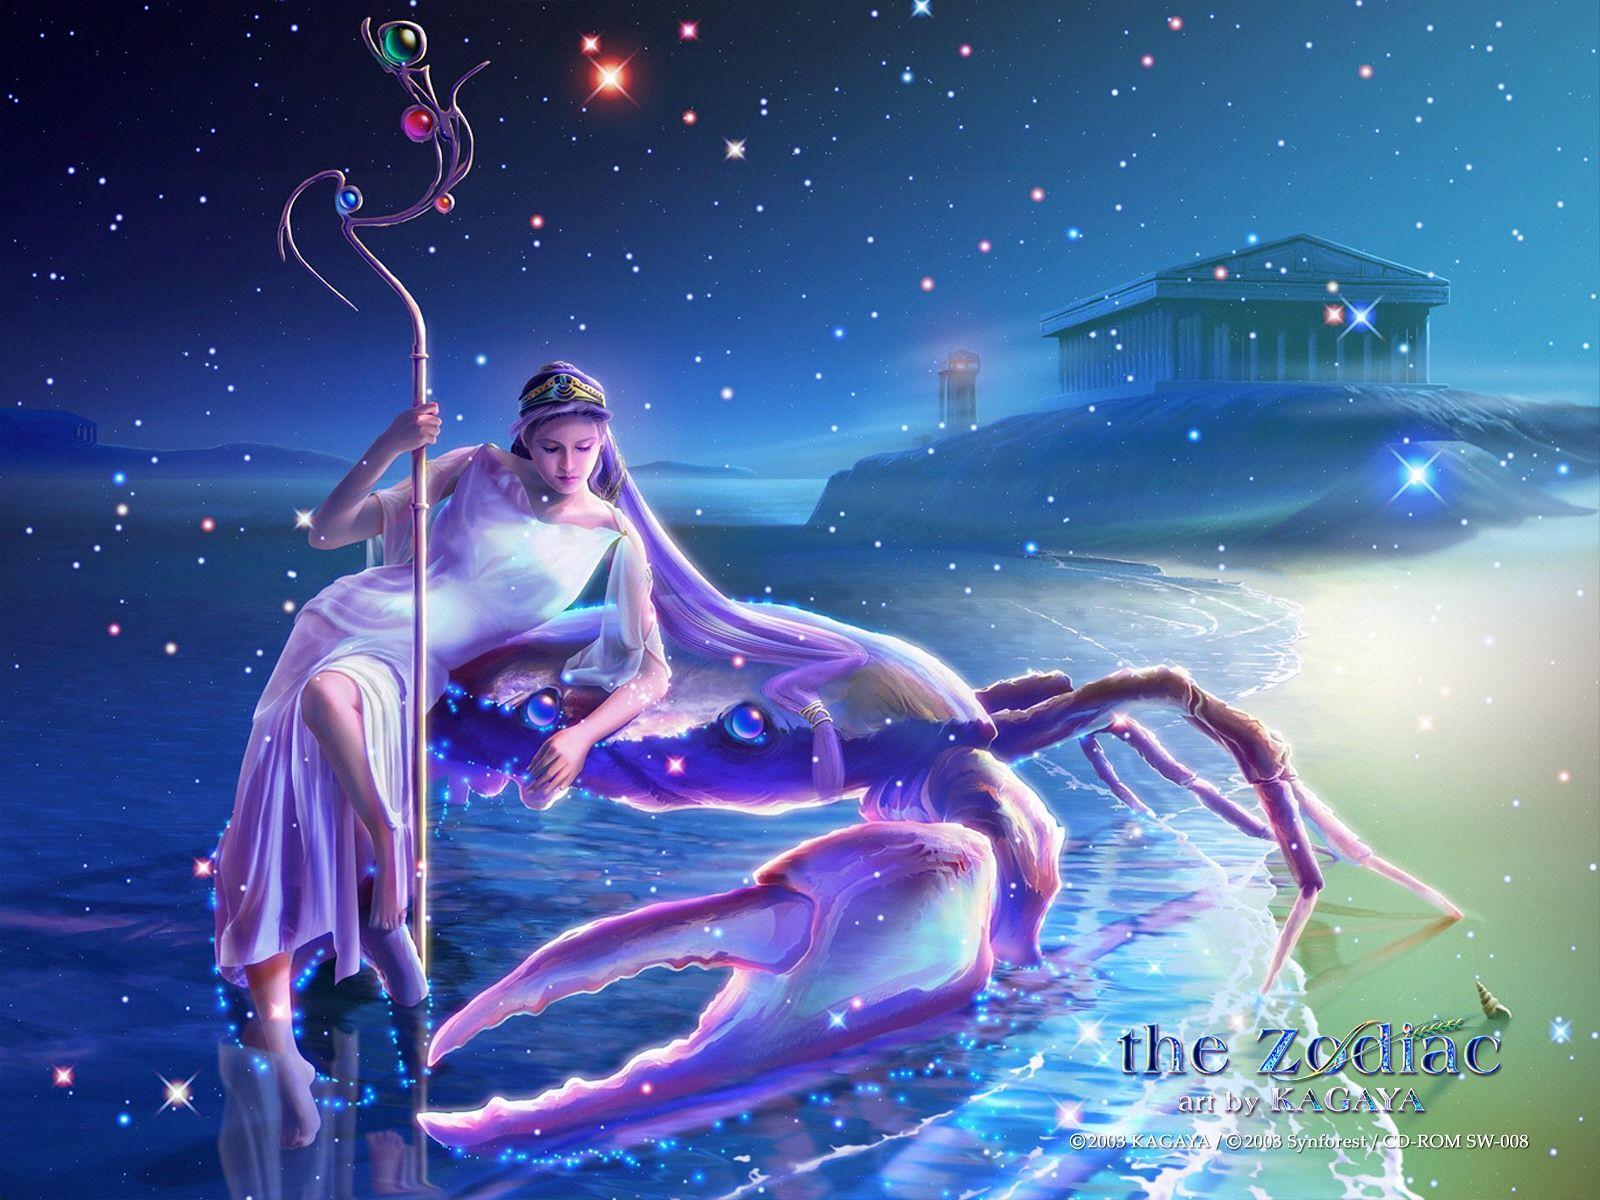 Astrology Artwork Kagaya Fantasy Art Kagaya Wallpaper Kagaya Zodiac Signs 1600 1200 Zodiac Signs Cancer Astrology Cancer Zodiac Art